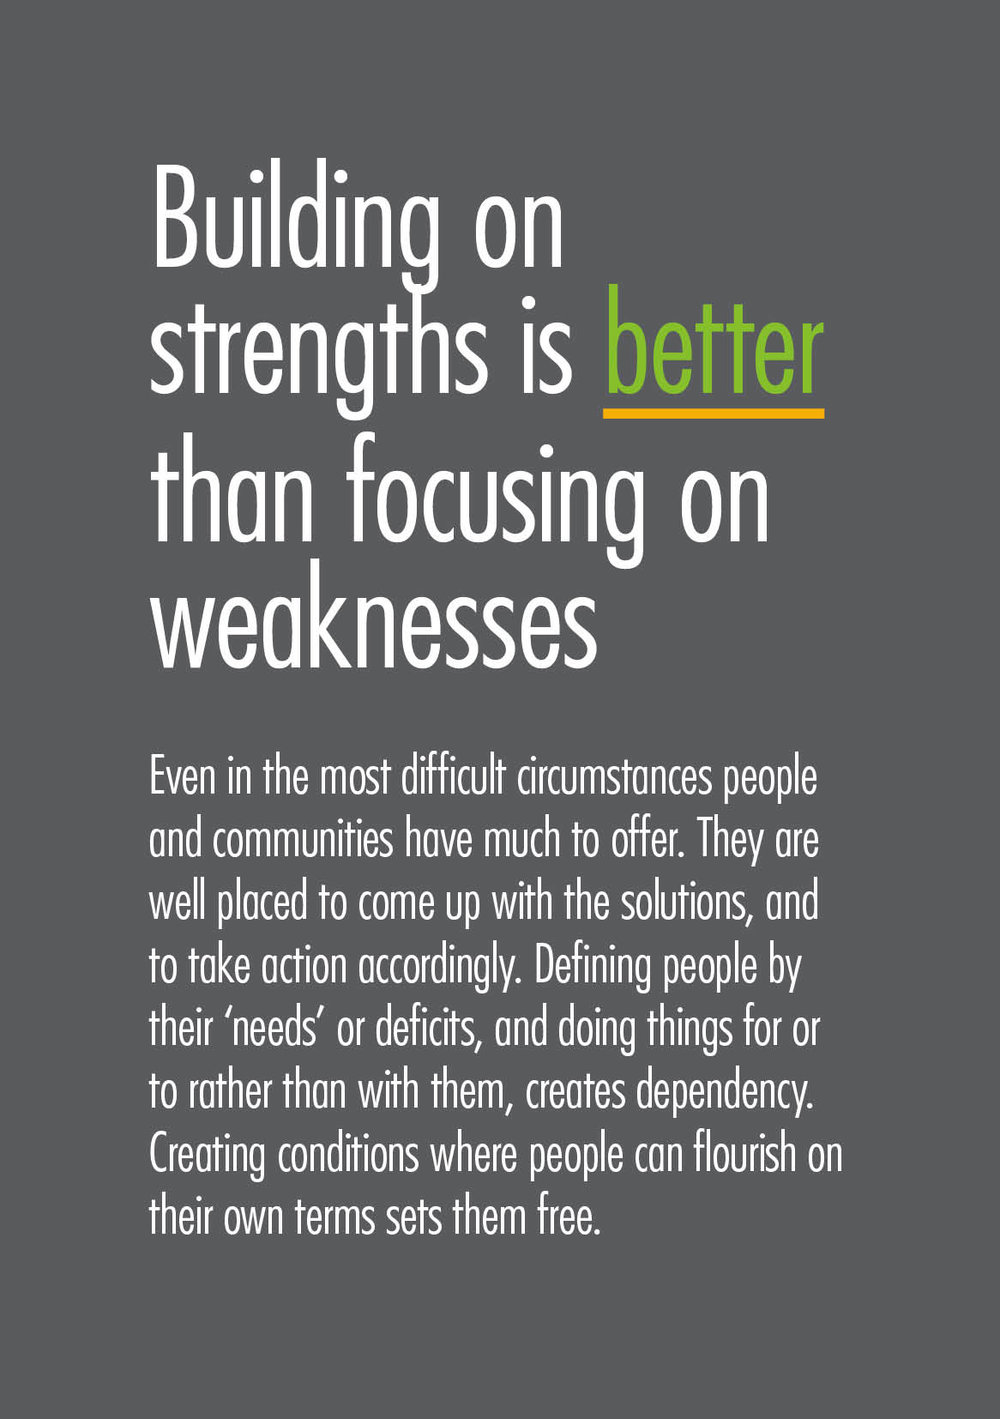 Building on strengths.jpg